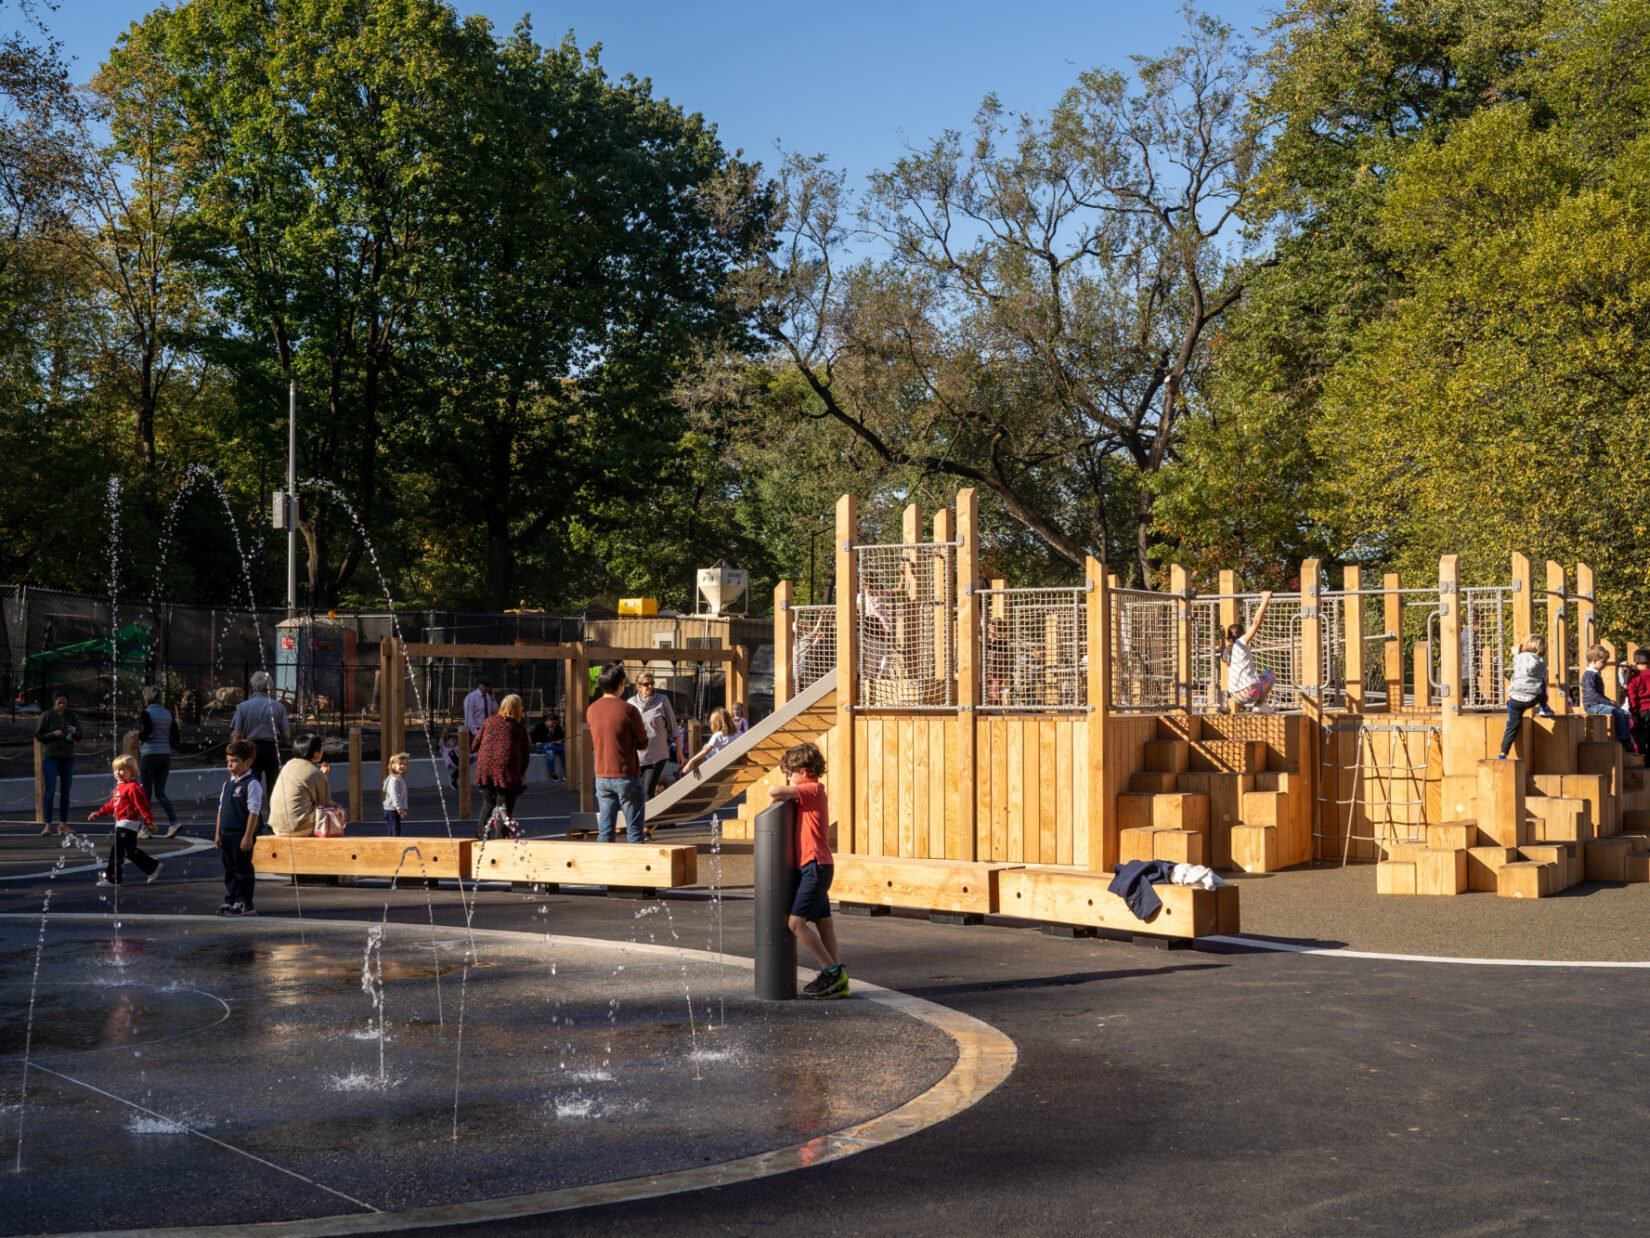 Children enjoying the Kempner Playground's wooden apparatus